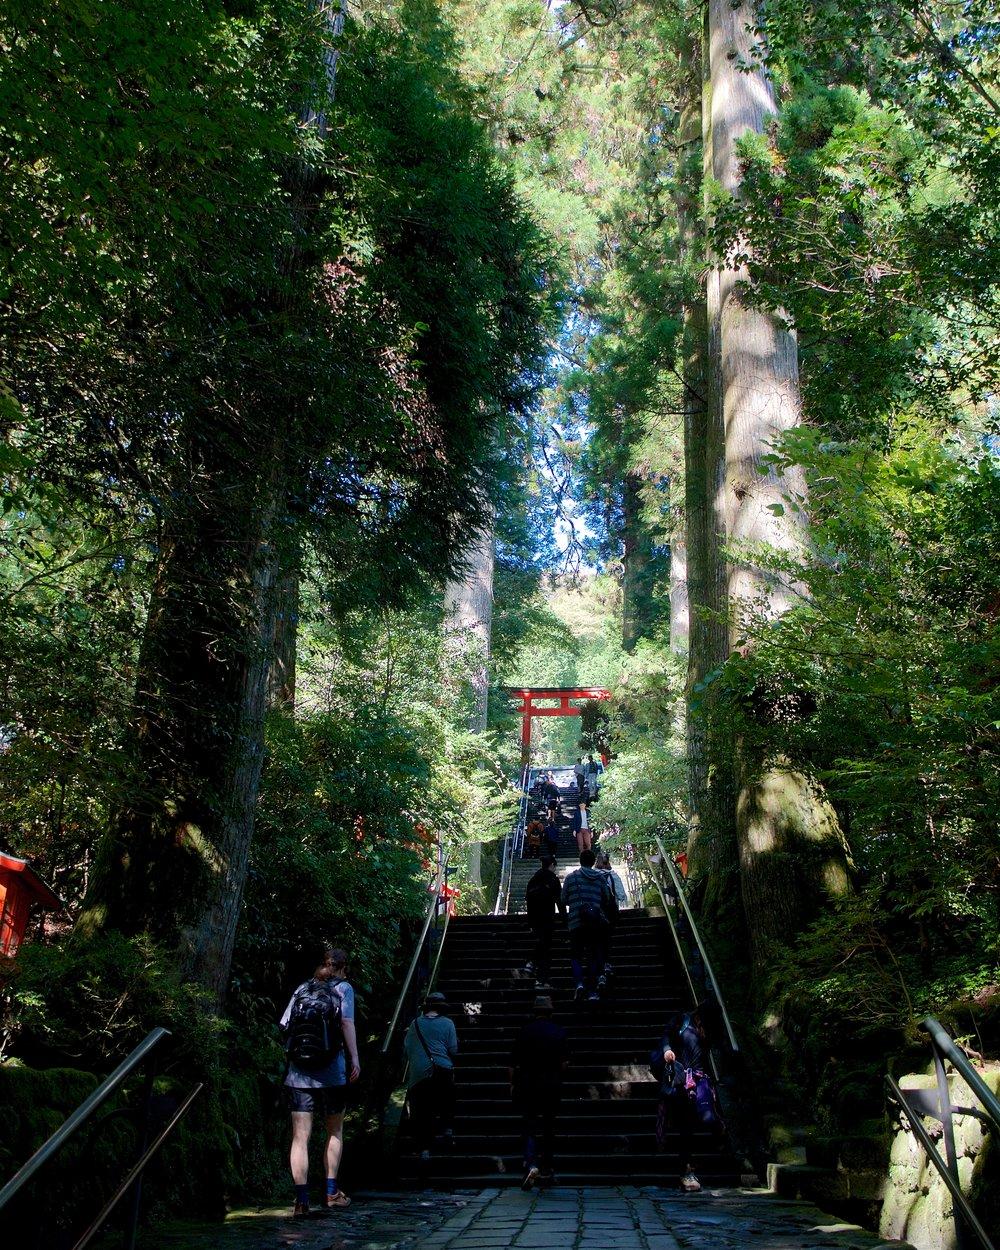 Yet more stairs going up to Hakone Shrine